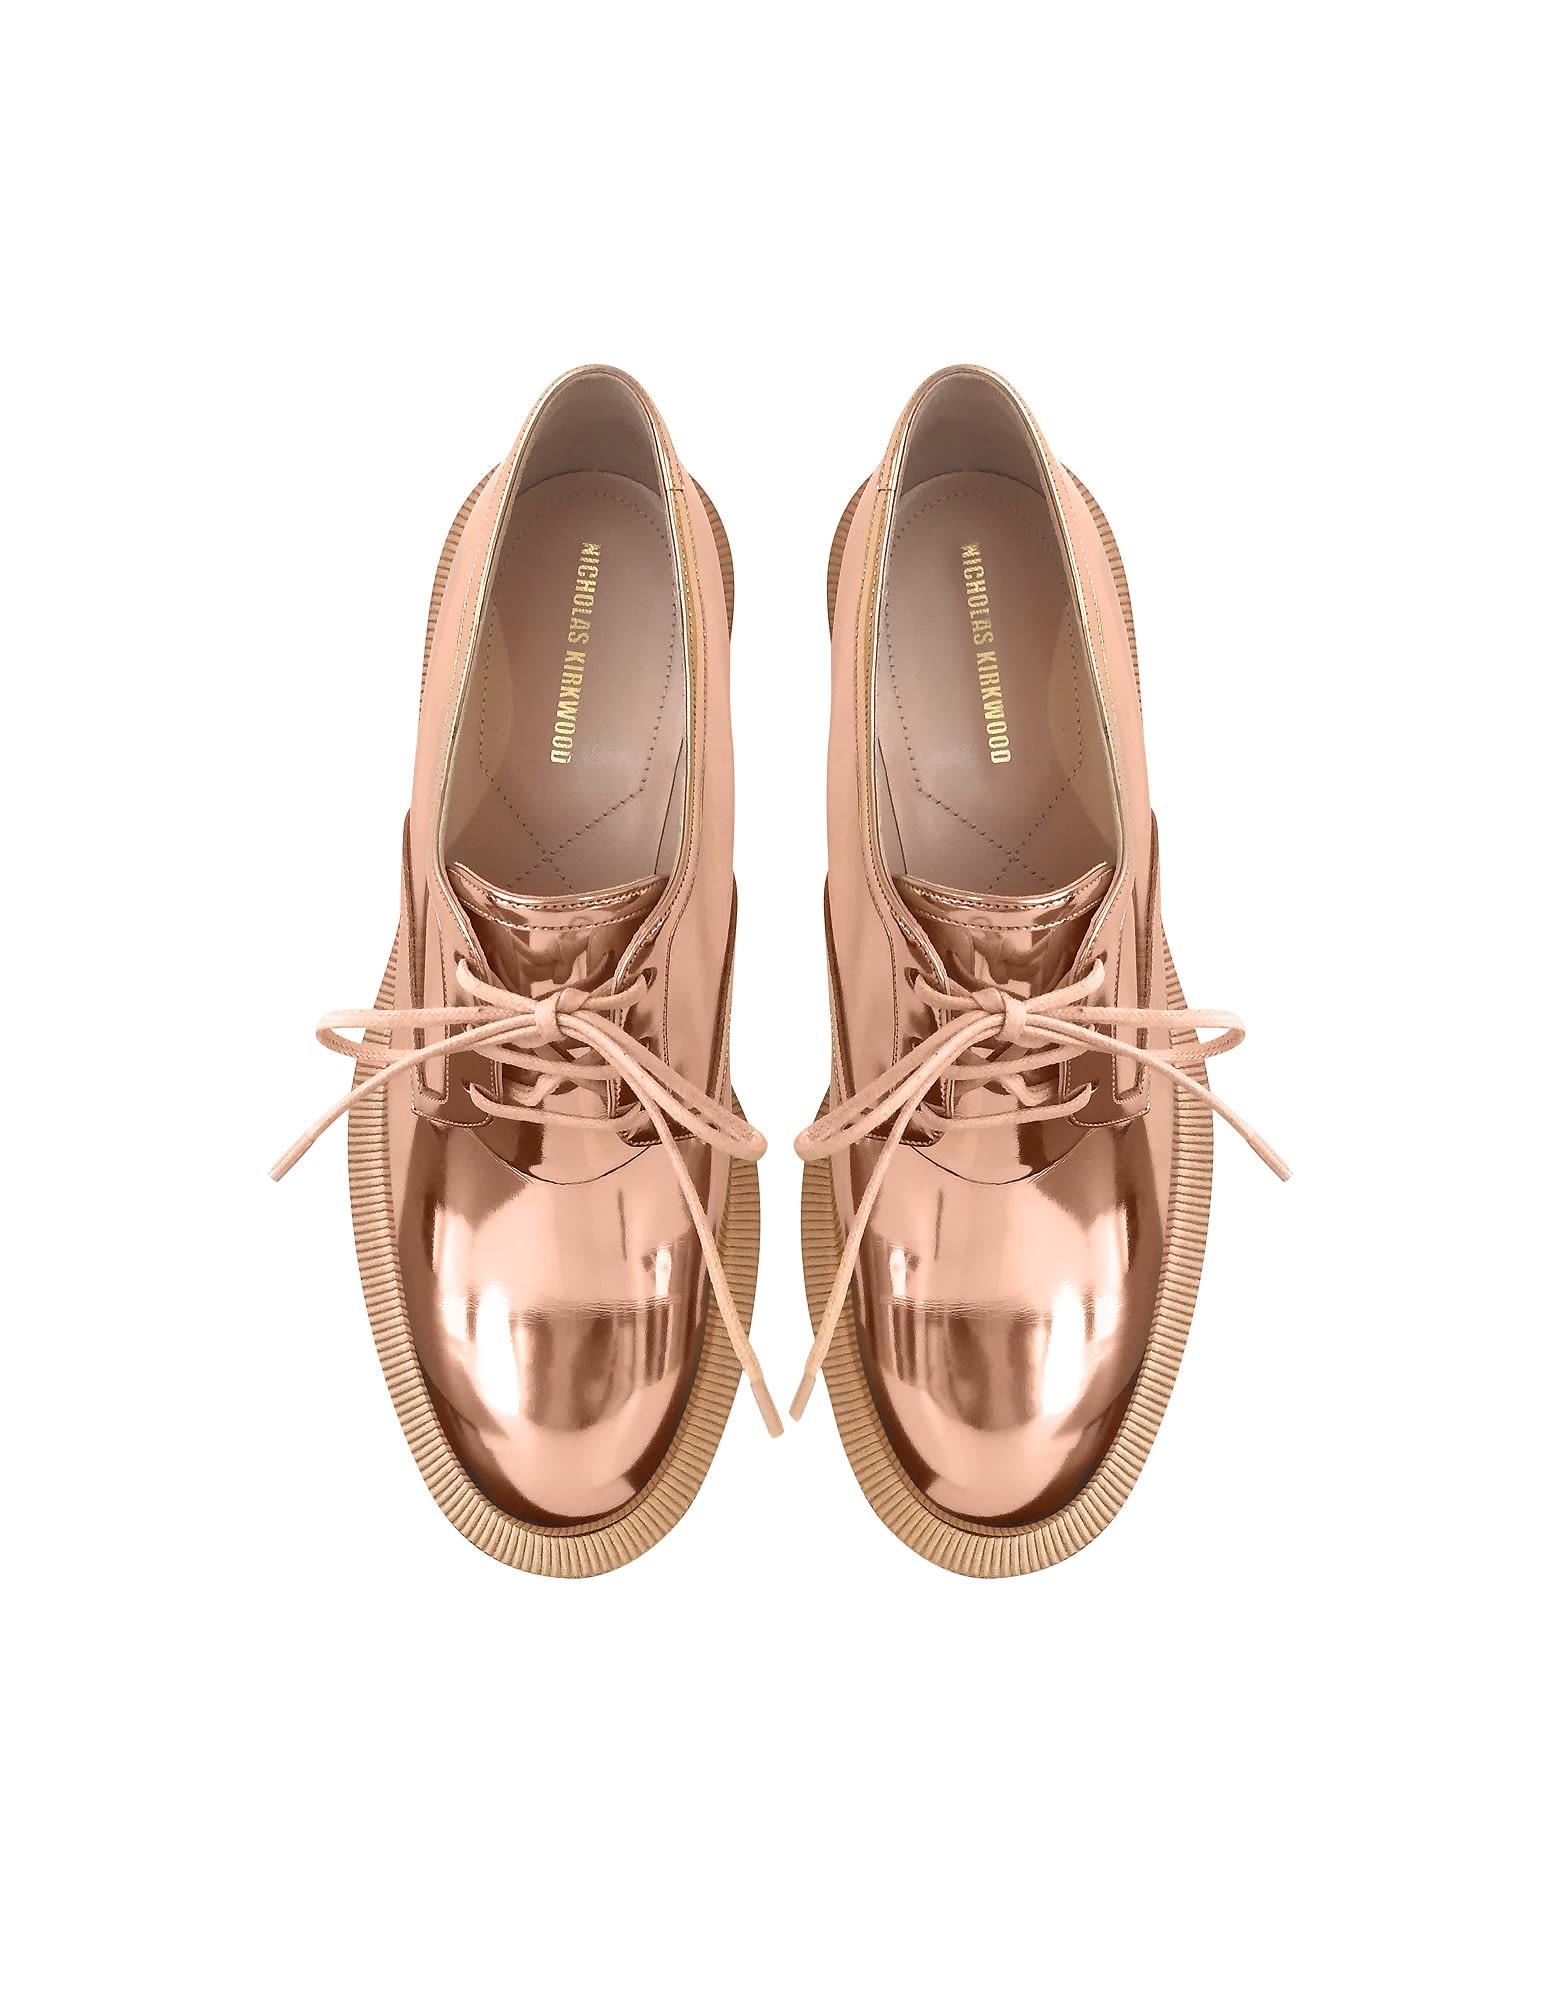 Nicholas Cuir Éco-brevet Cuivre Kirkwood Chaussures Derby Perle Casati jyUVbAnH0